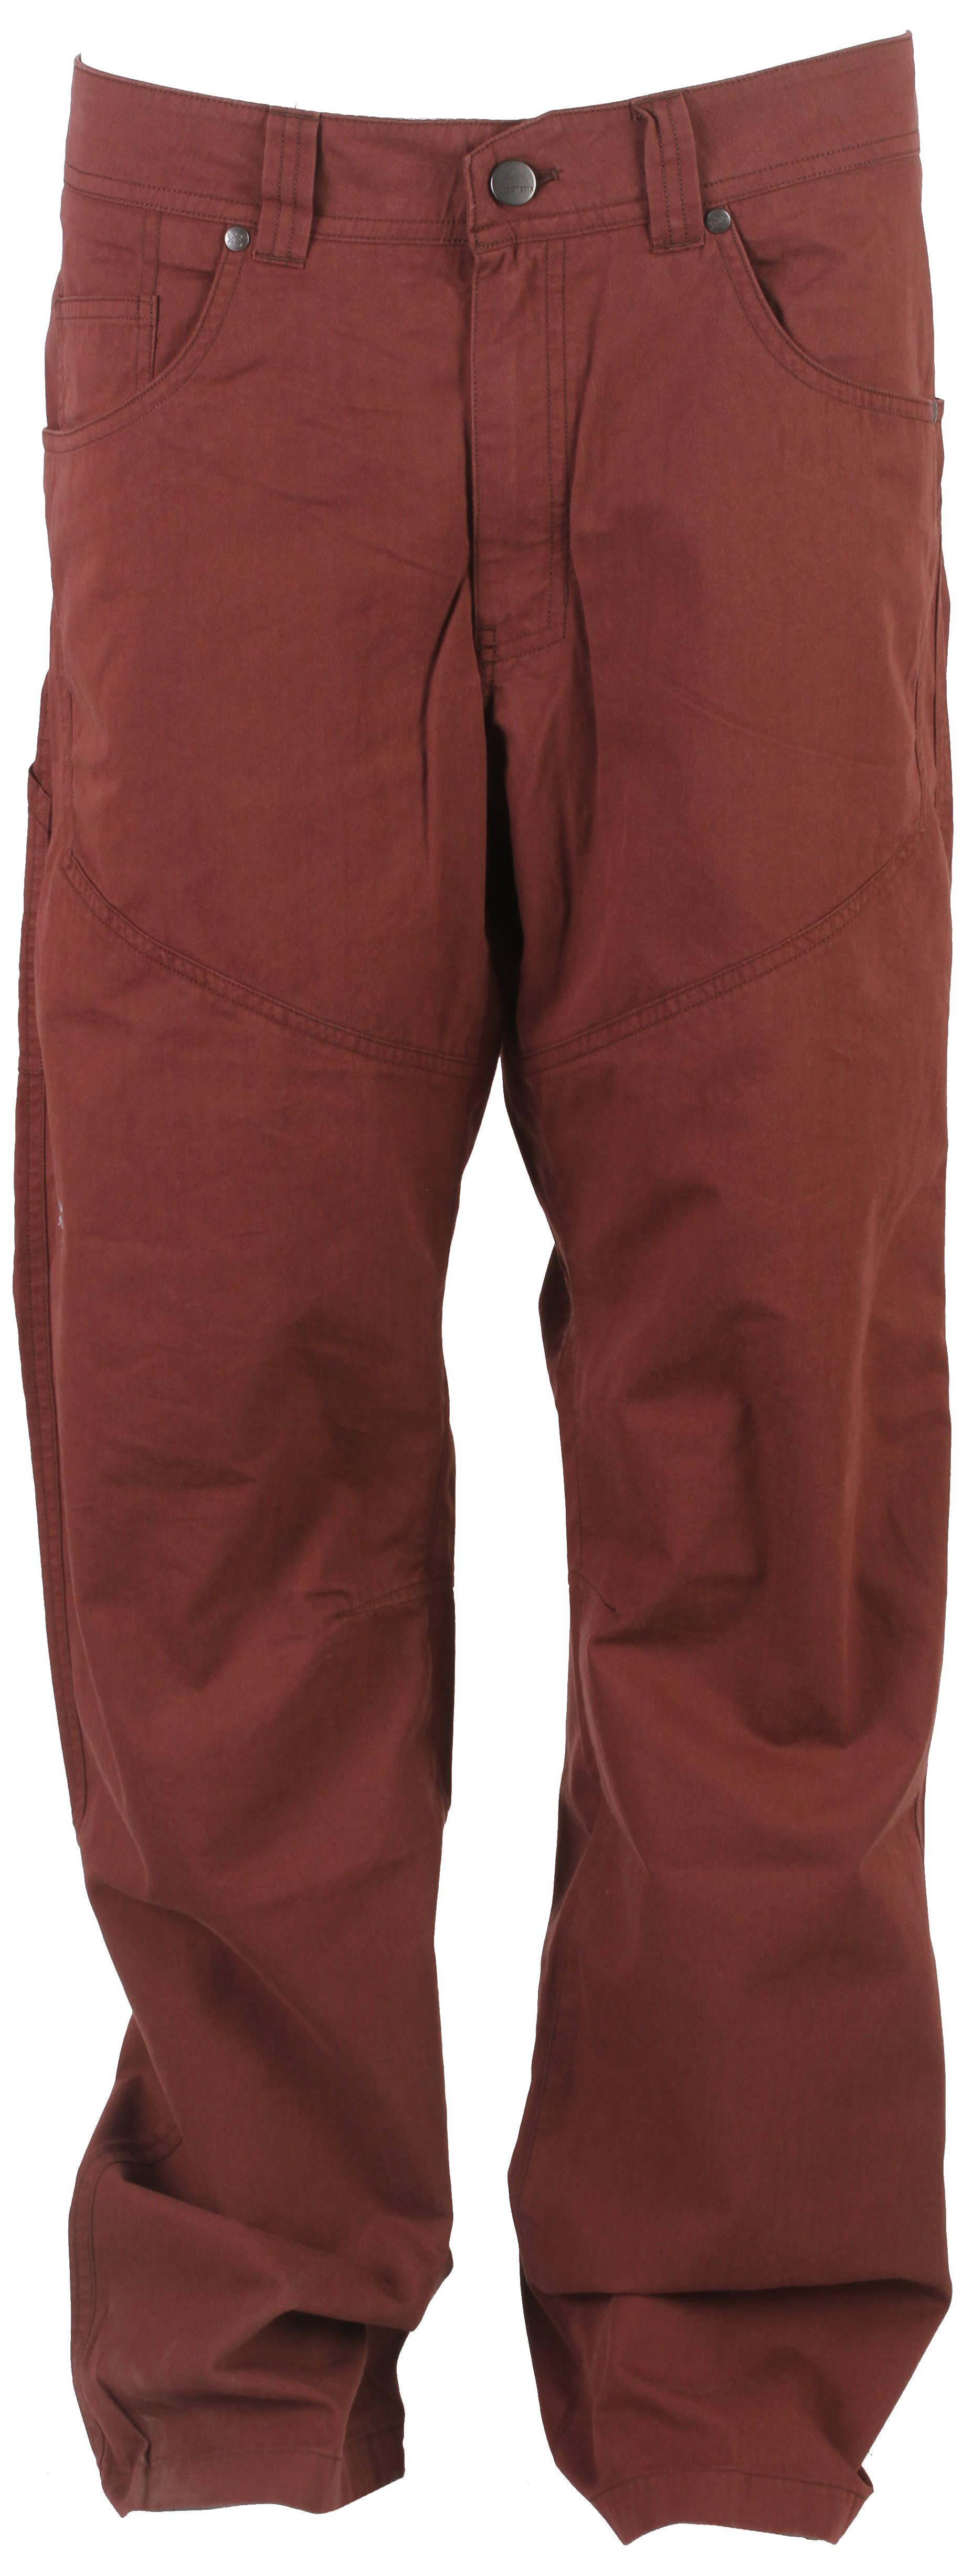 Arc'teryx Bastion Pants ac4bas32rw16zz-arcteryx-casual-pants